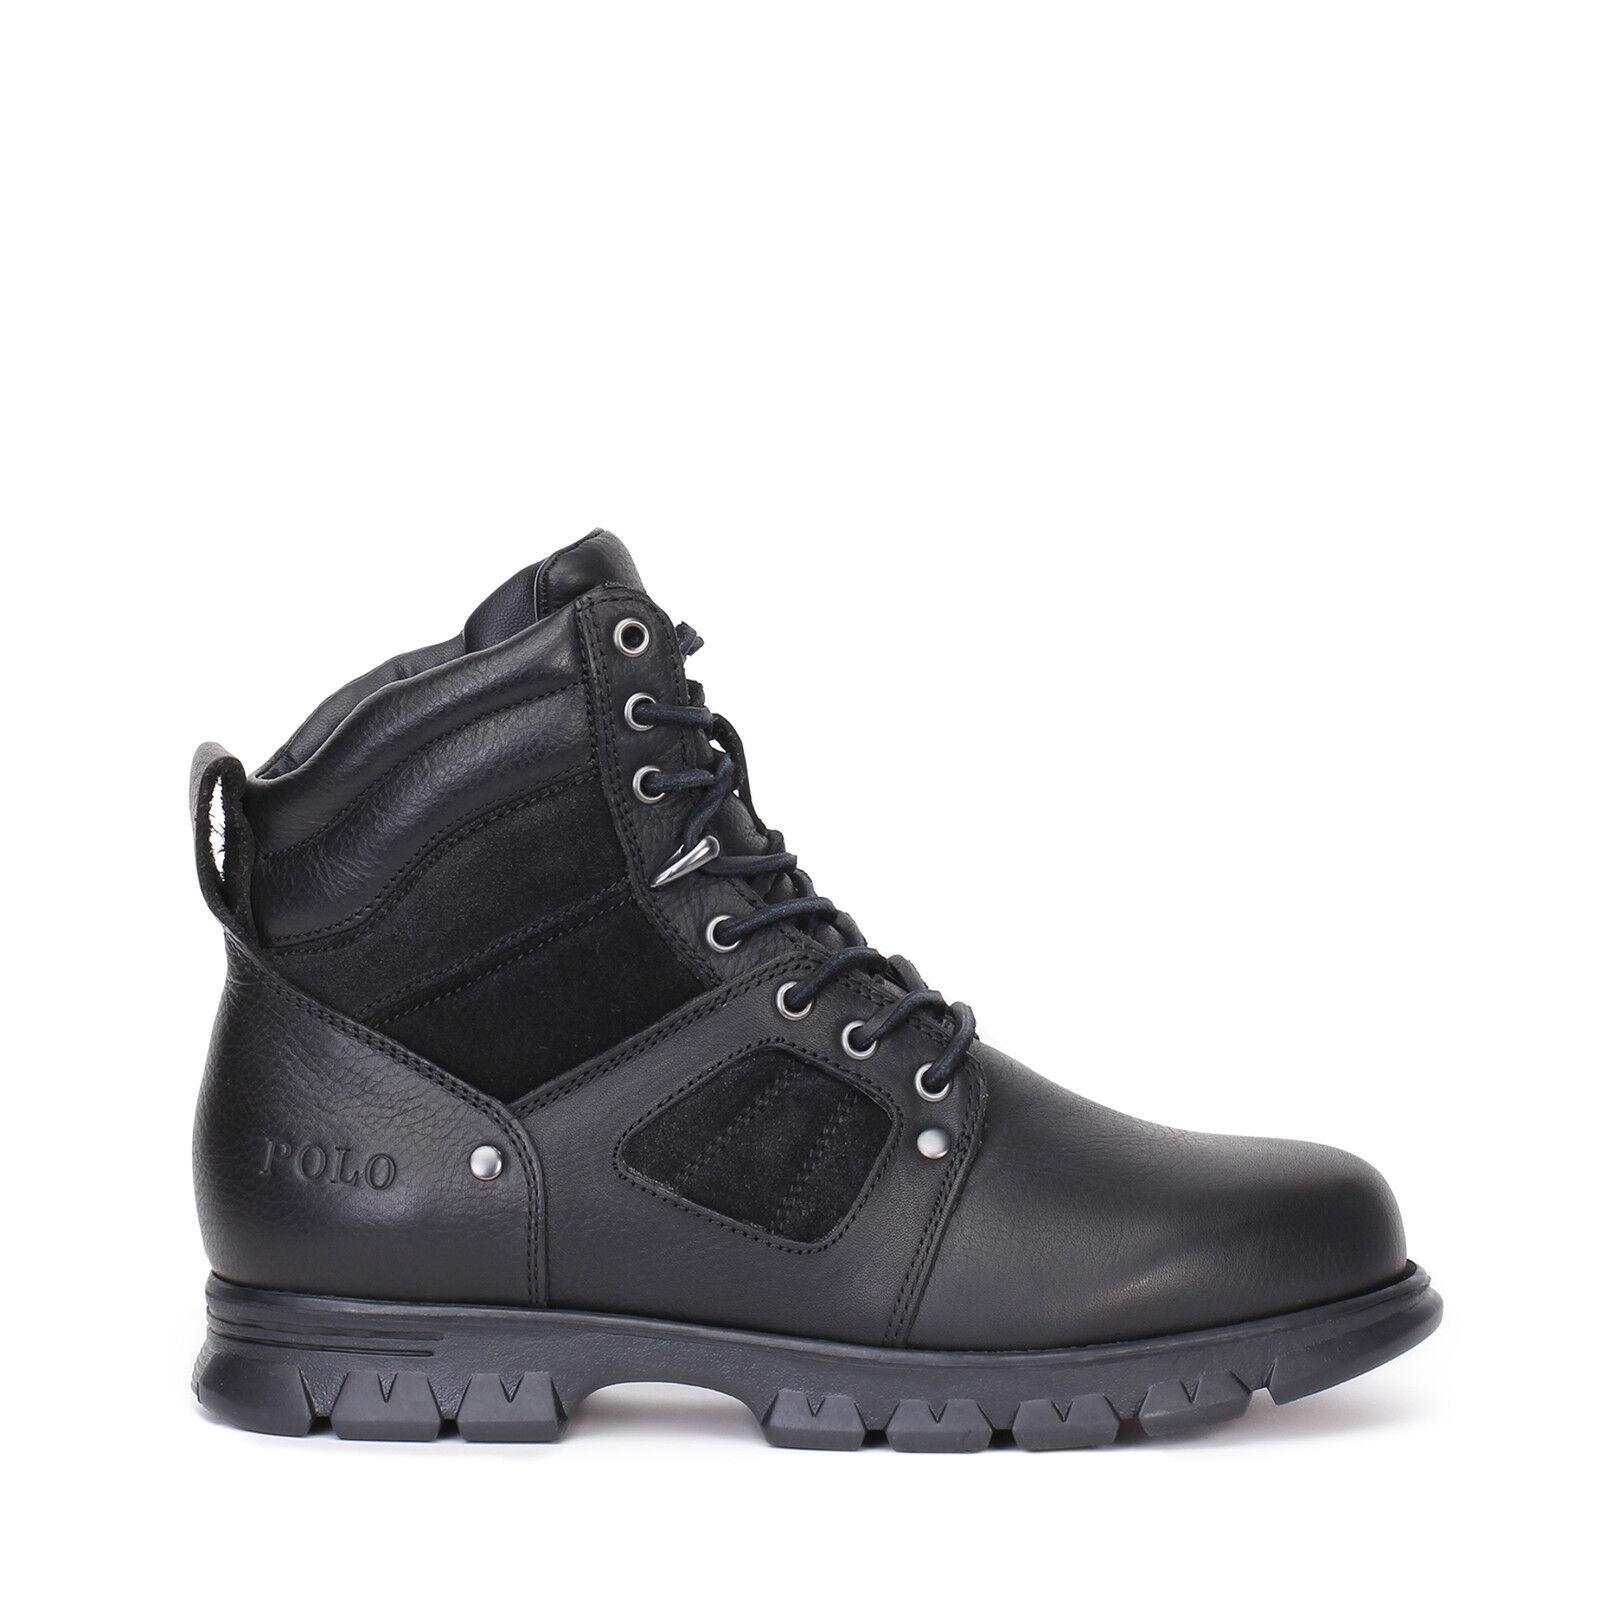 Polo Ralph Lauren Mens Casual Boots Diego Black Leather Ebay # Muebles Ralph Lauren Espana